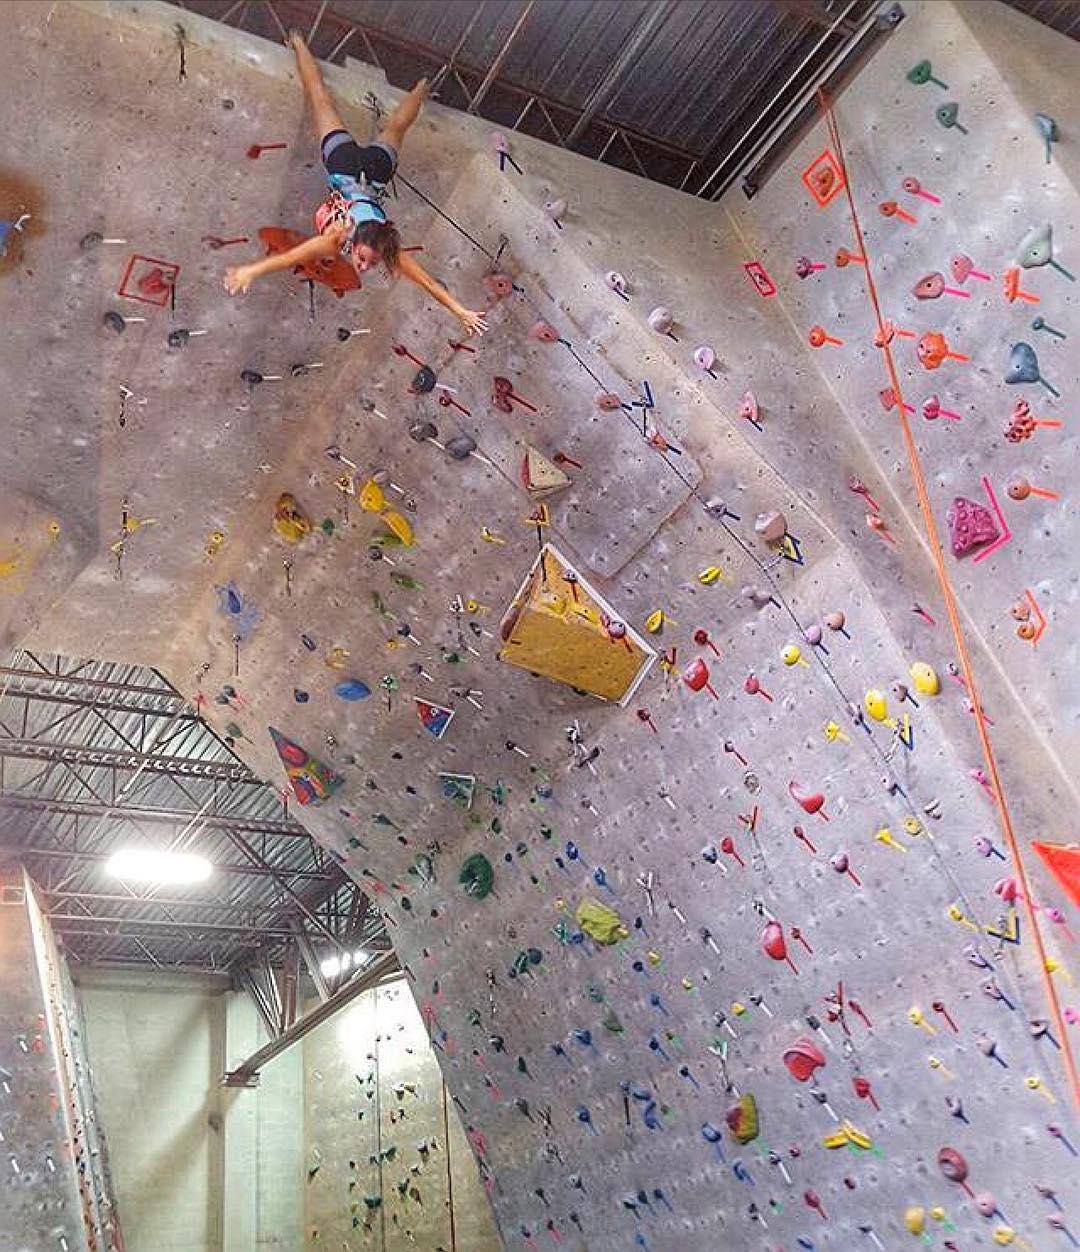 X-treme Rock Climbing Center - Miami Information